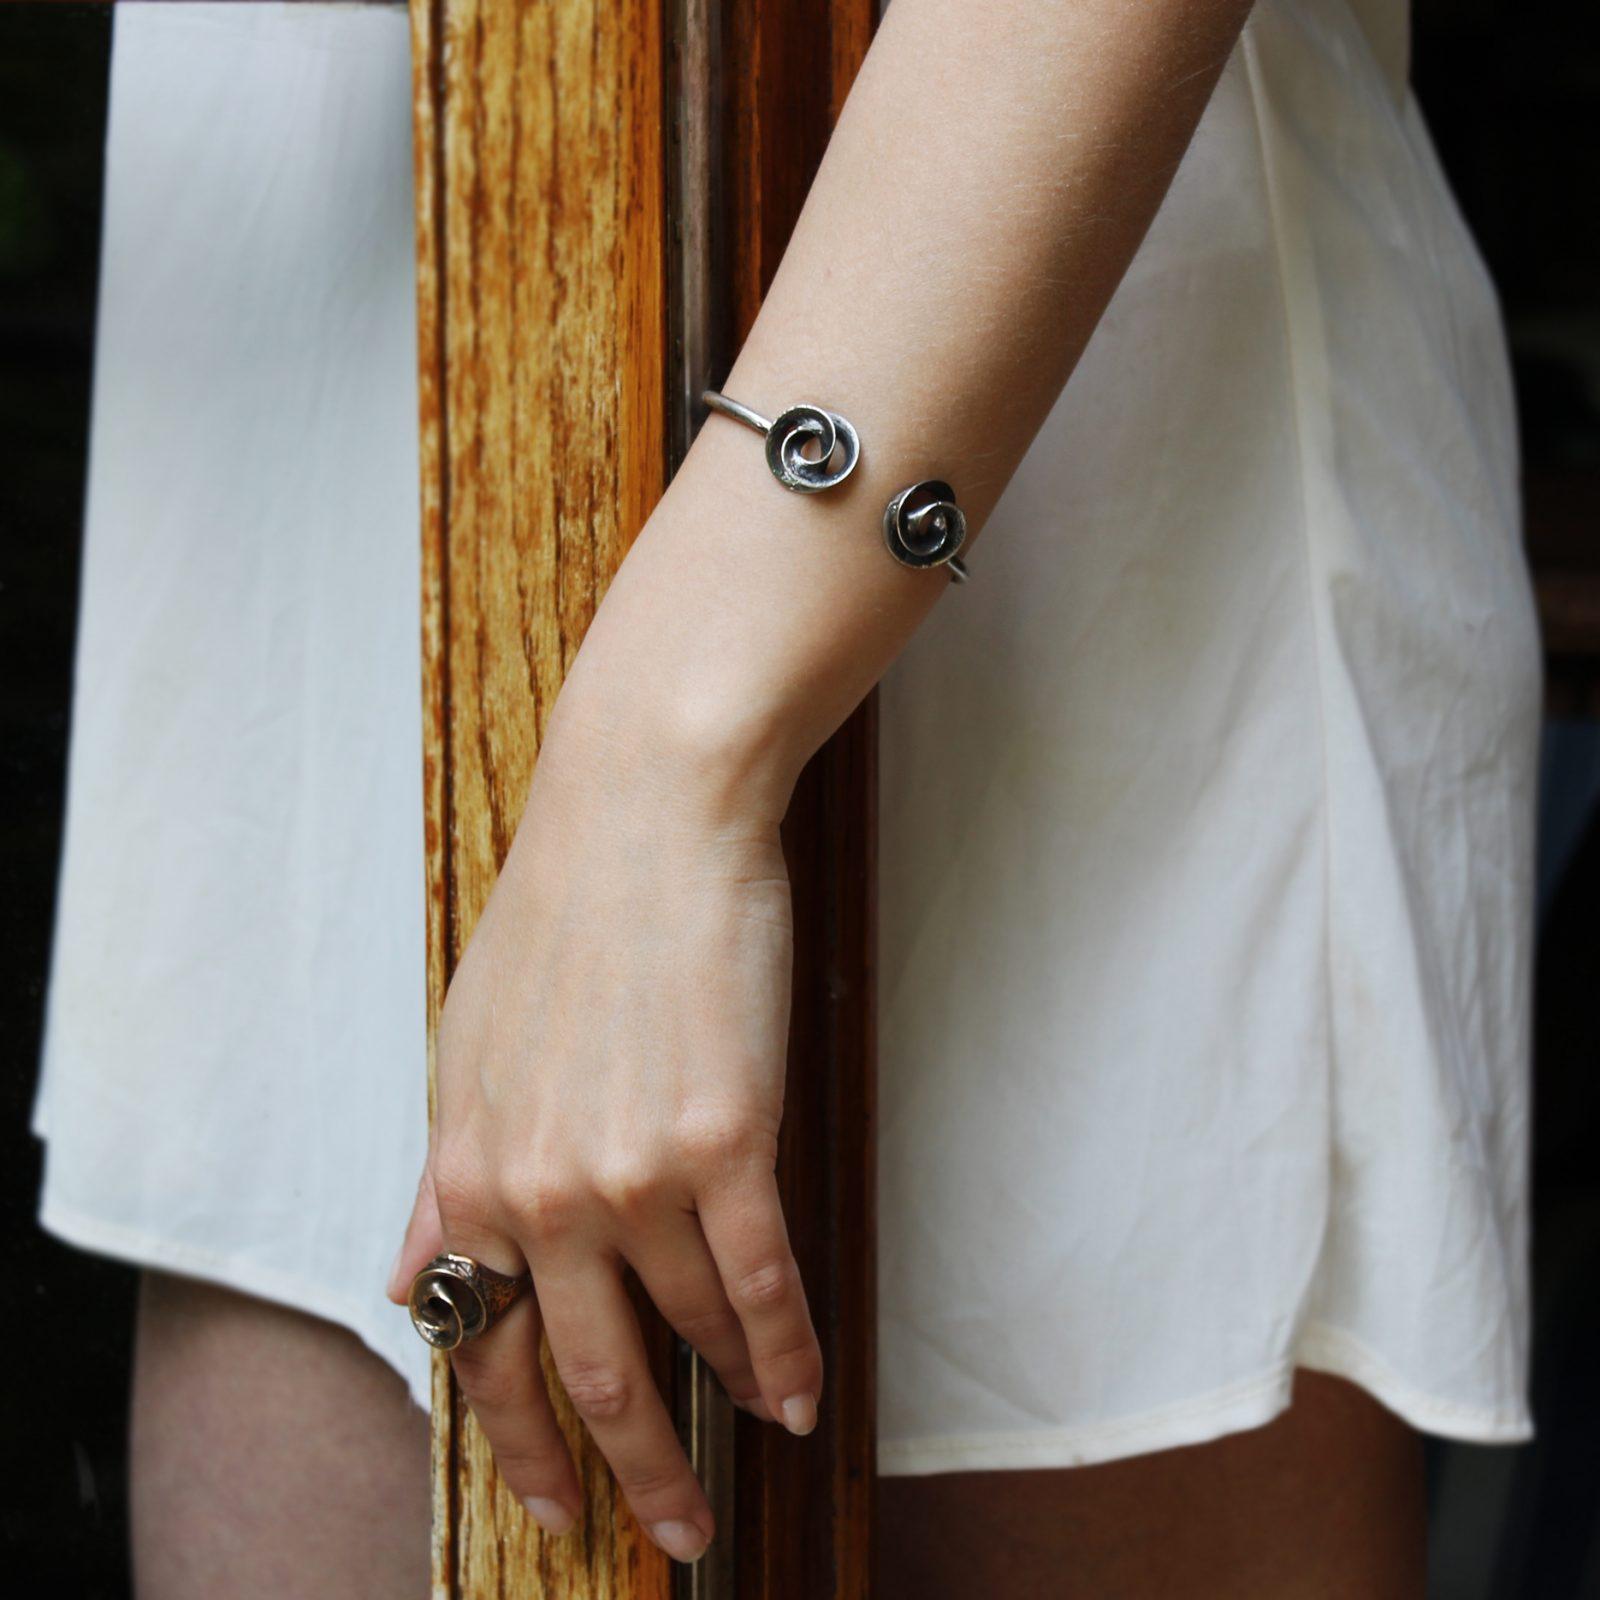 bracciale rigido vortici in argento icudal